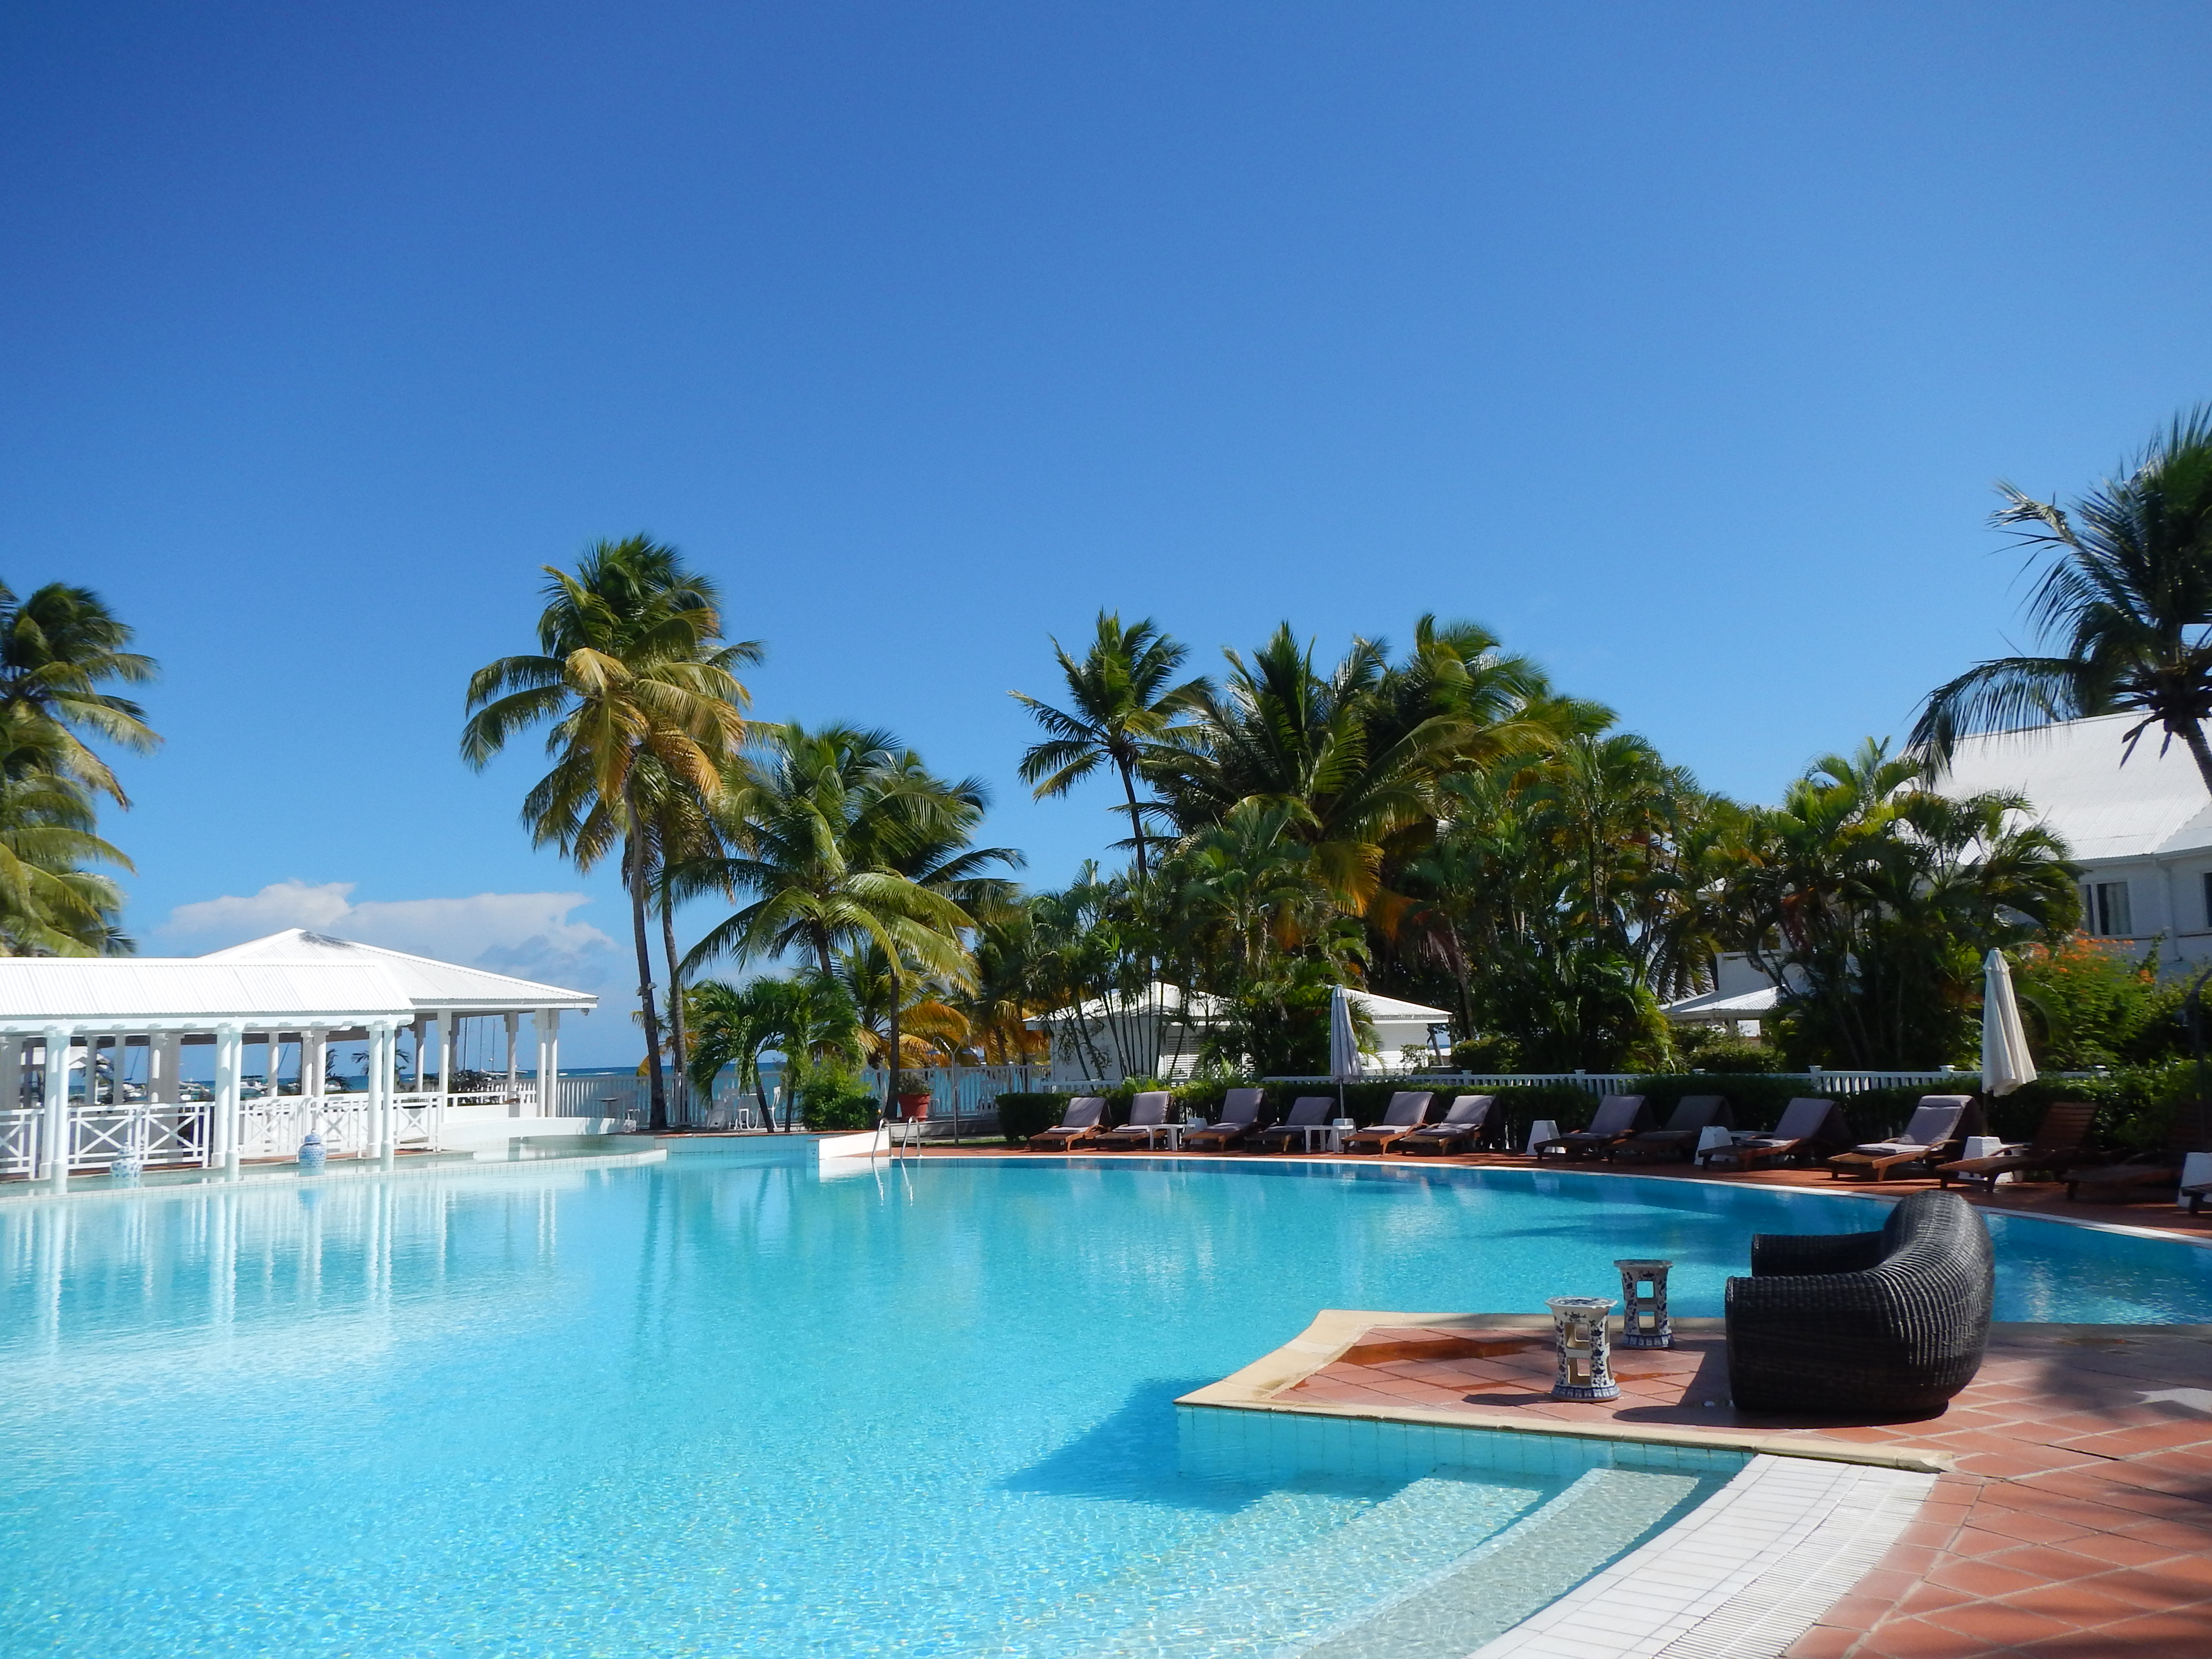 La Cocoteraie Piscine Guadeloupe.JPG